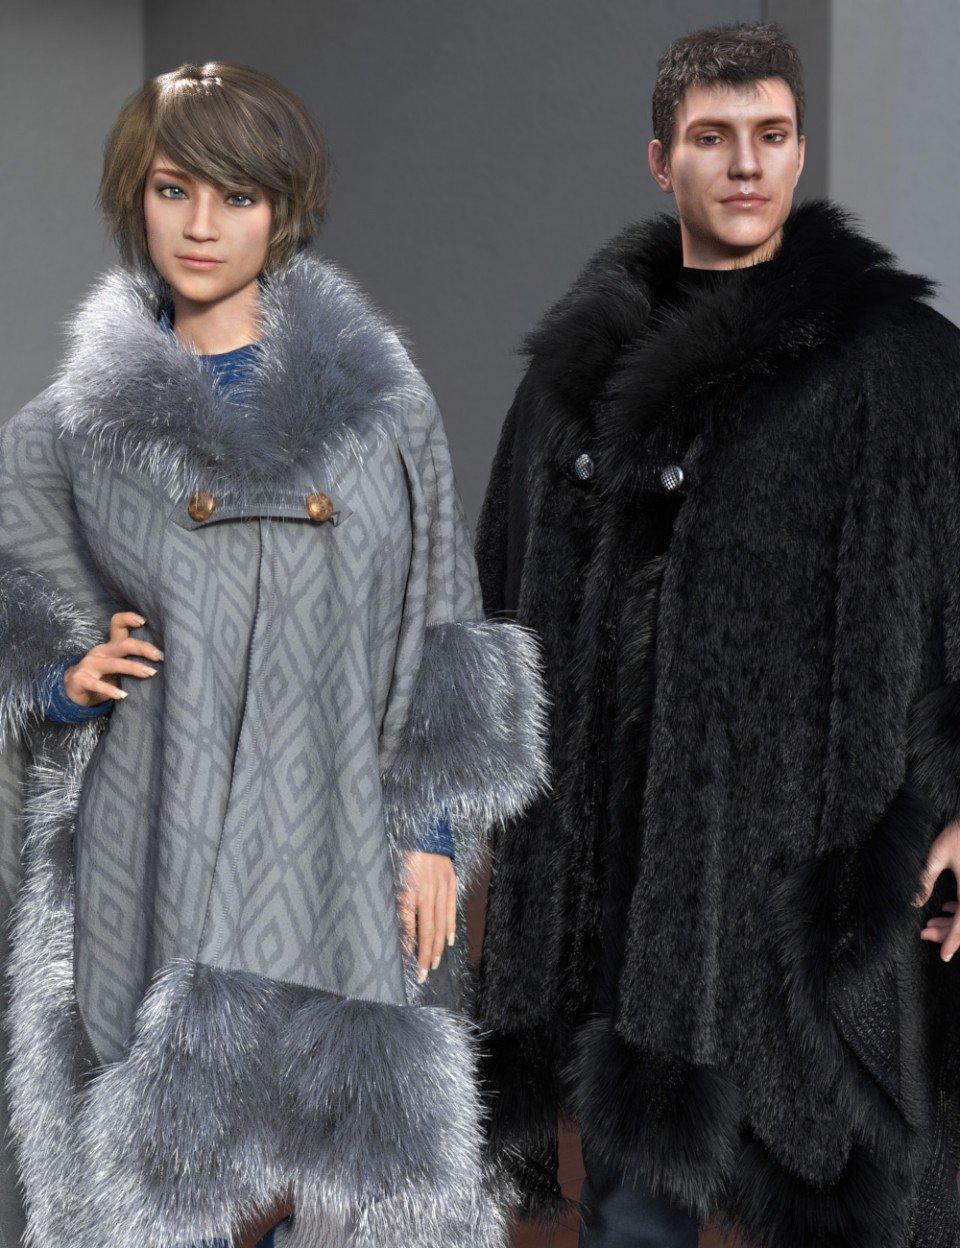 dForce Real Fur Poncho for Genesis 8_DAZ3D下载站